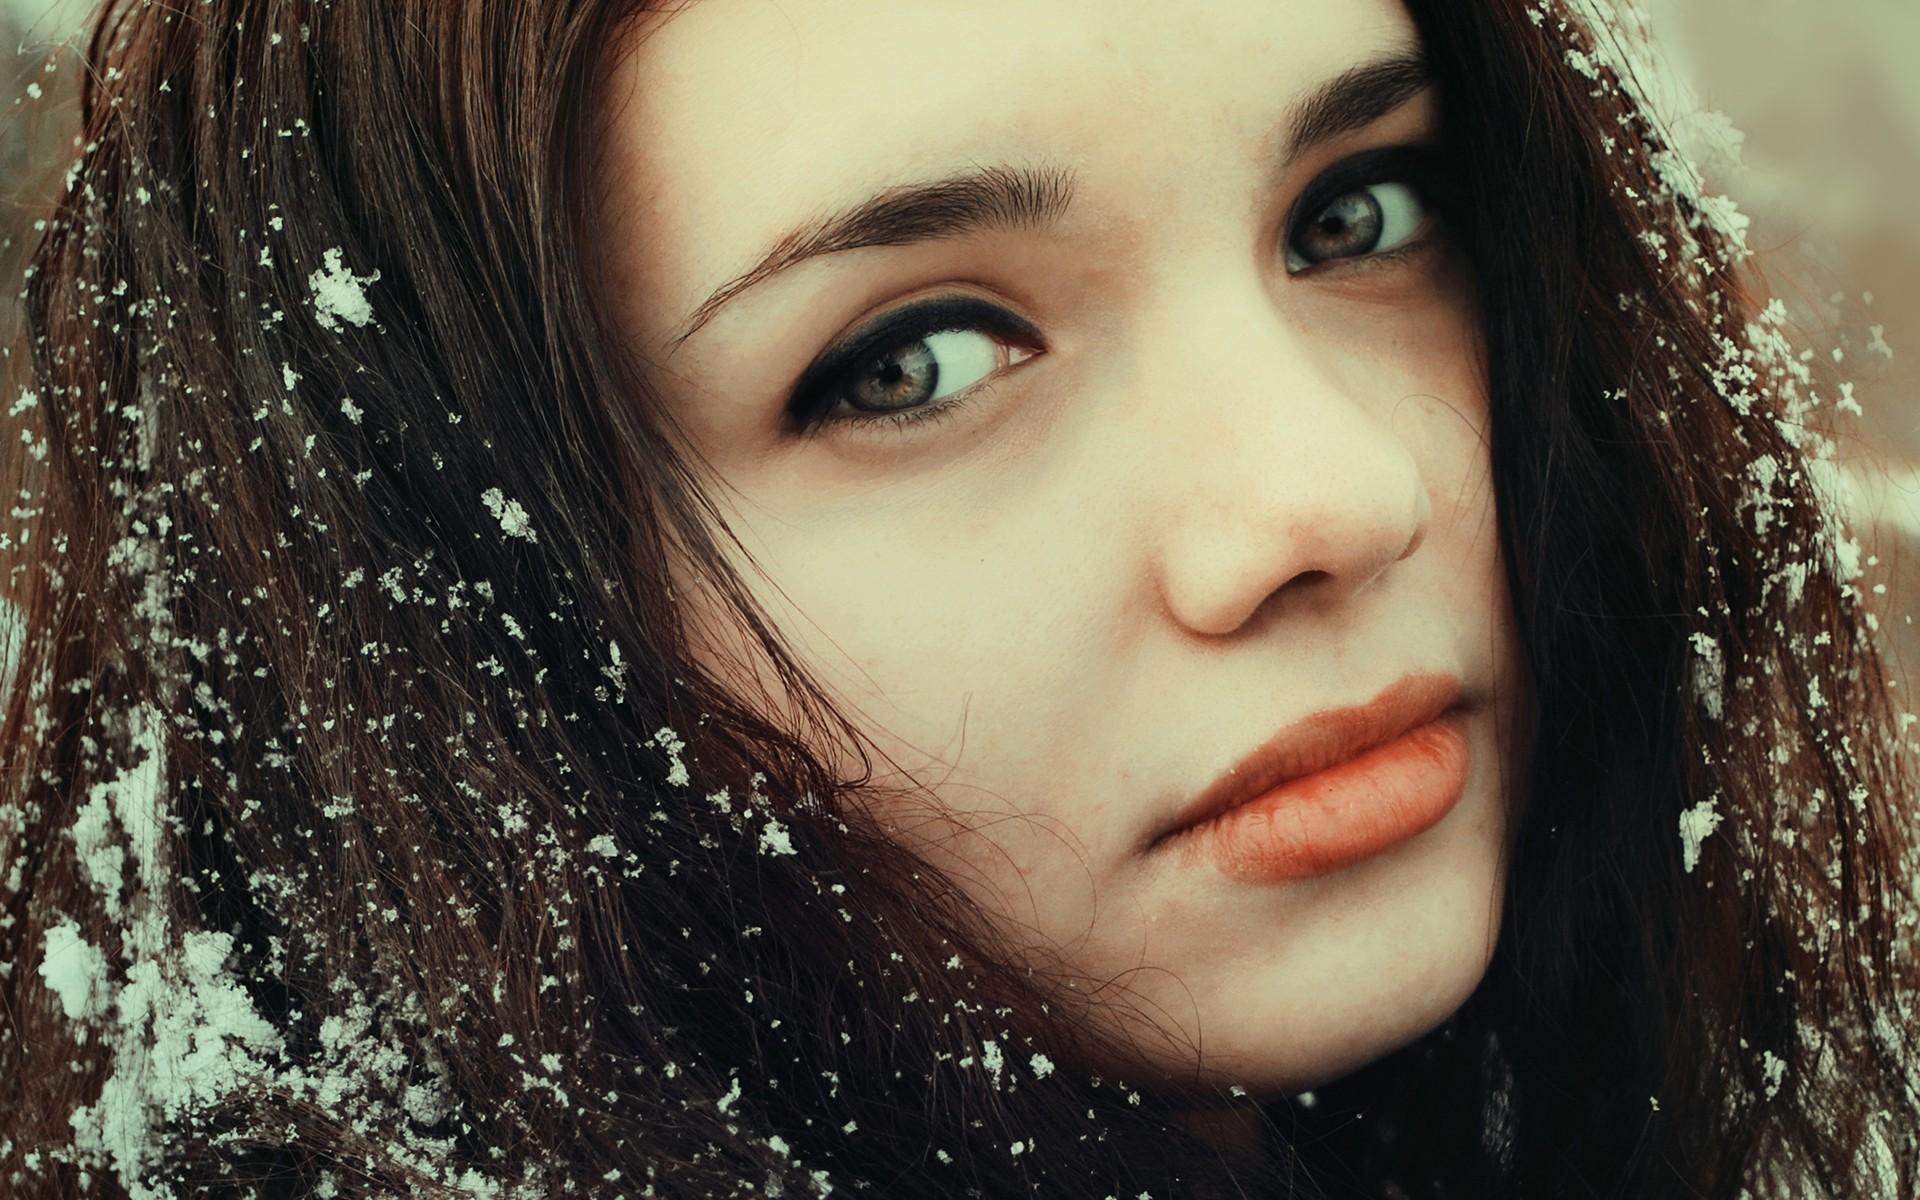 Картинки на аву девушек зимы брюнеток